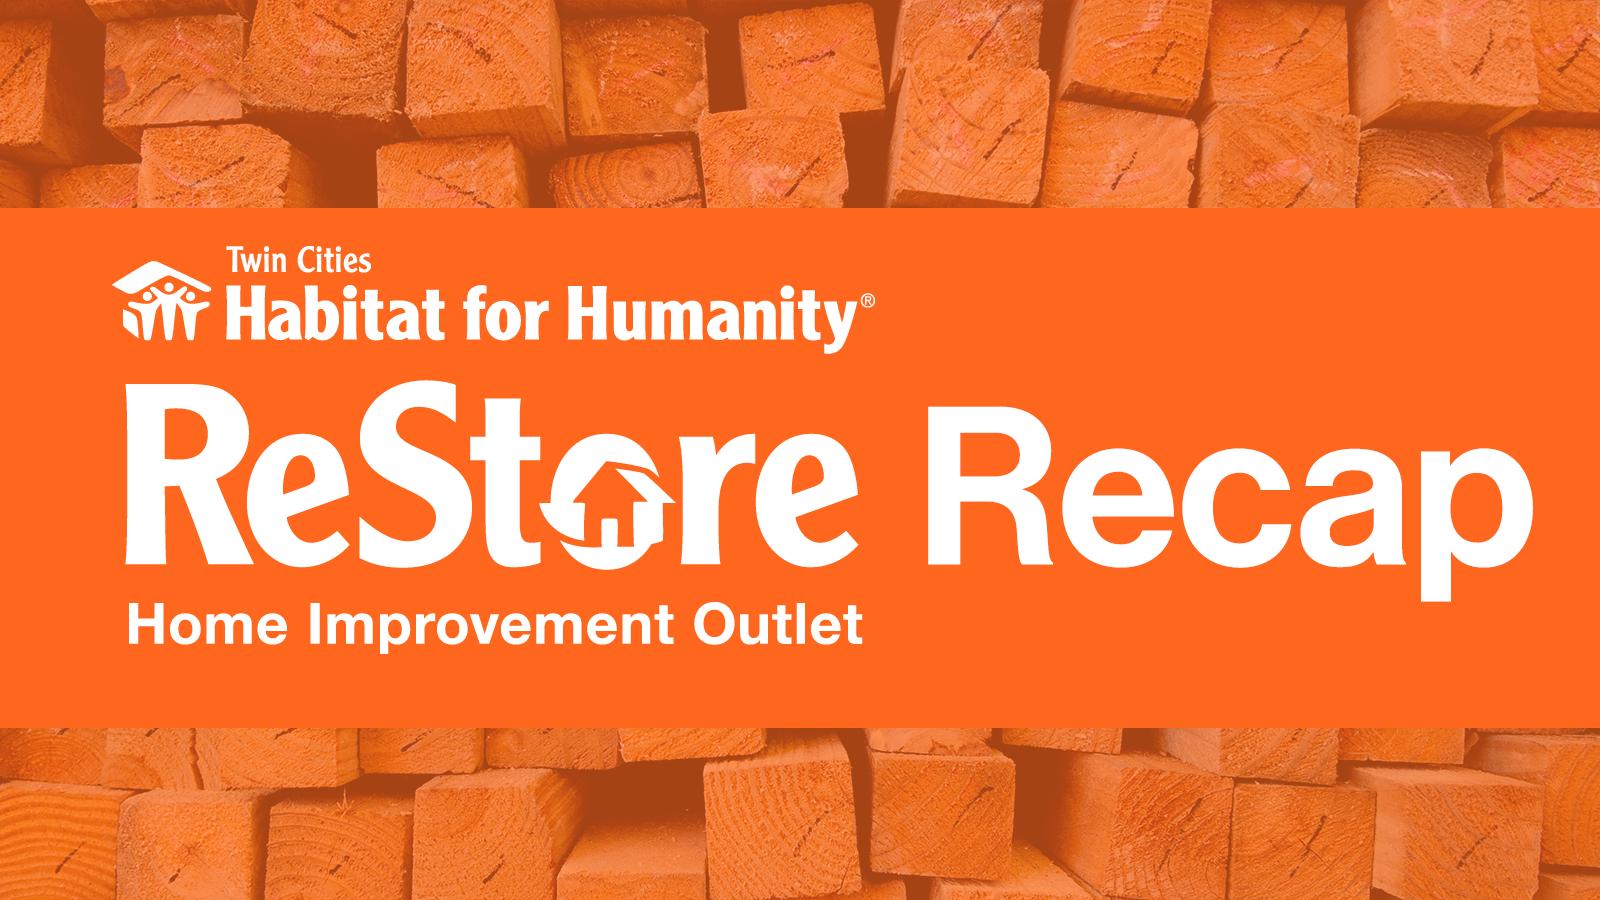 ReStore Recap